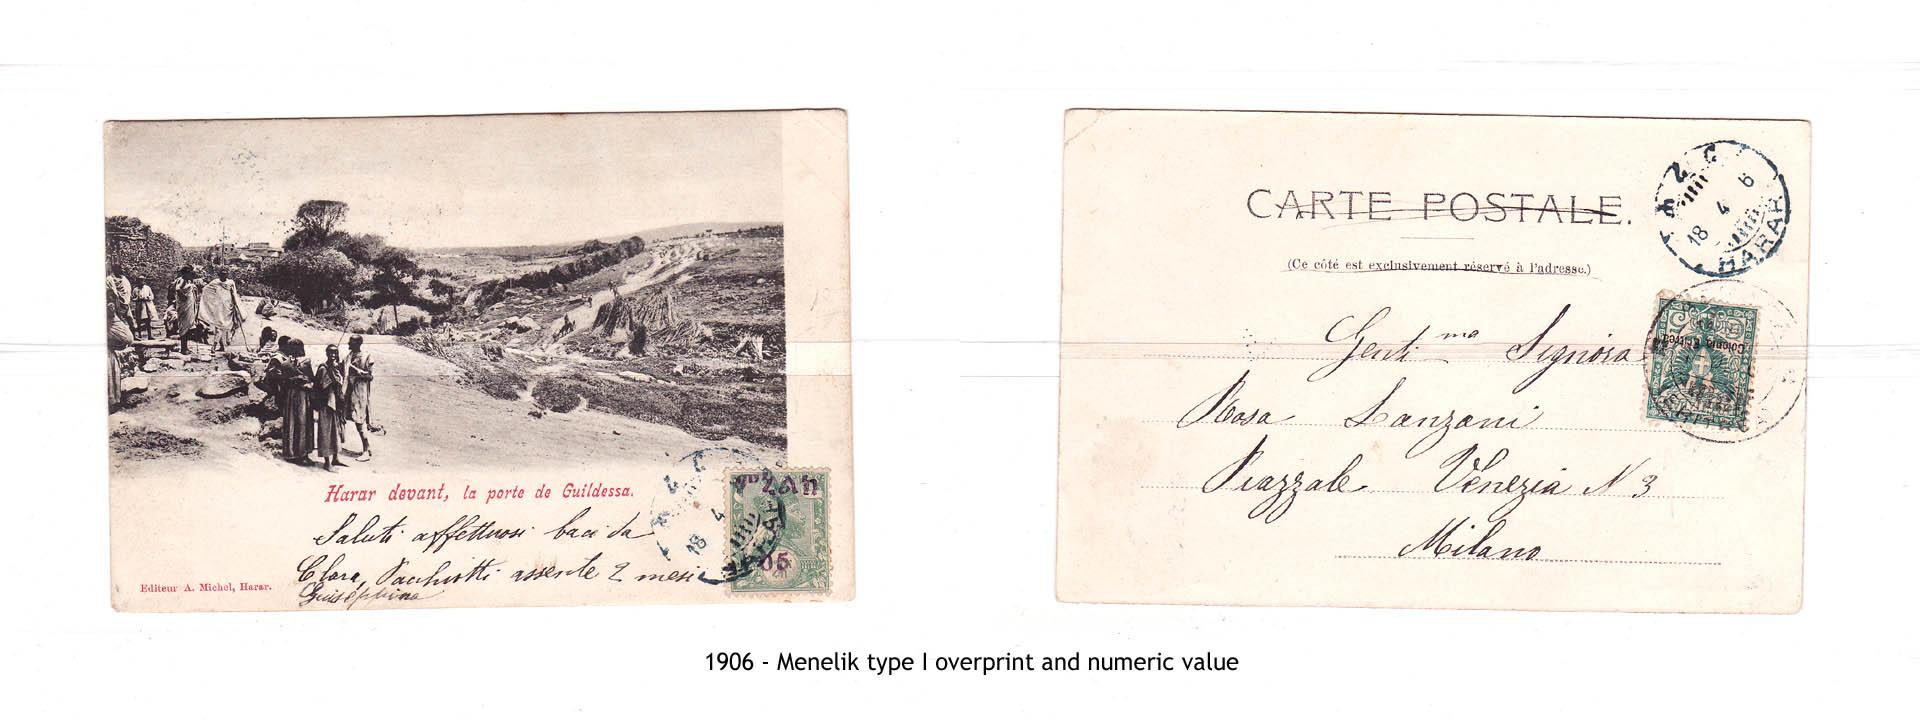 1906 - Menelik type I overprint + numeric value